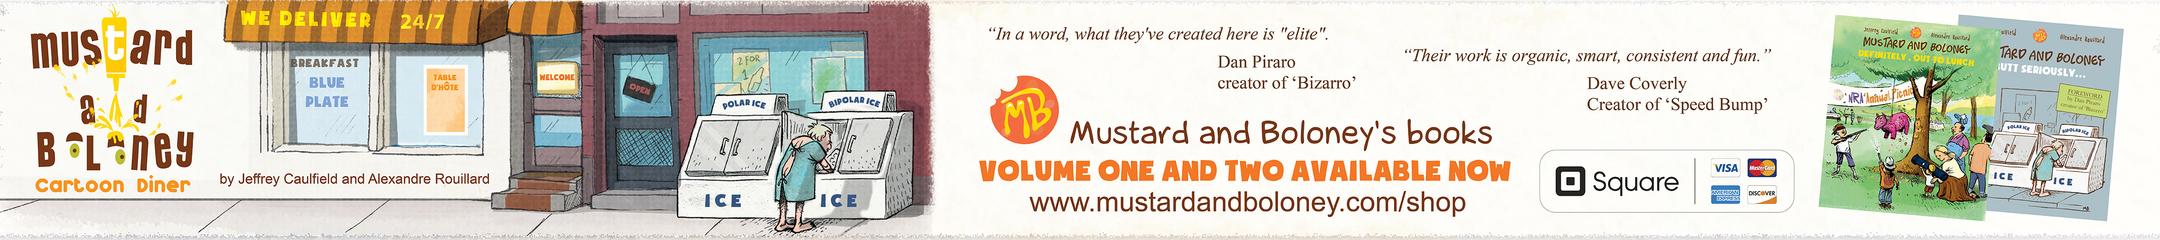 Mustard and Boloney